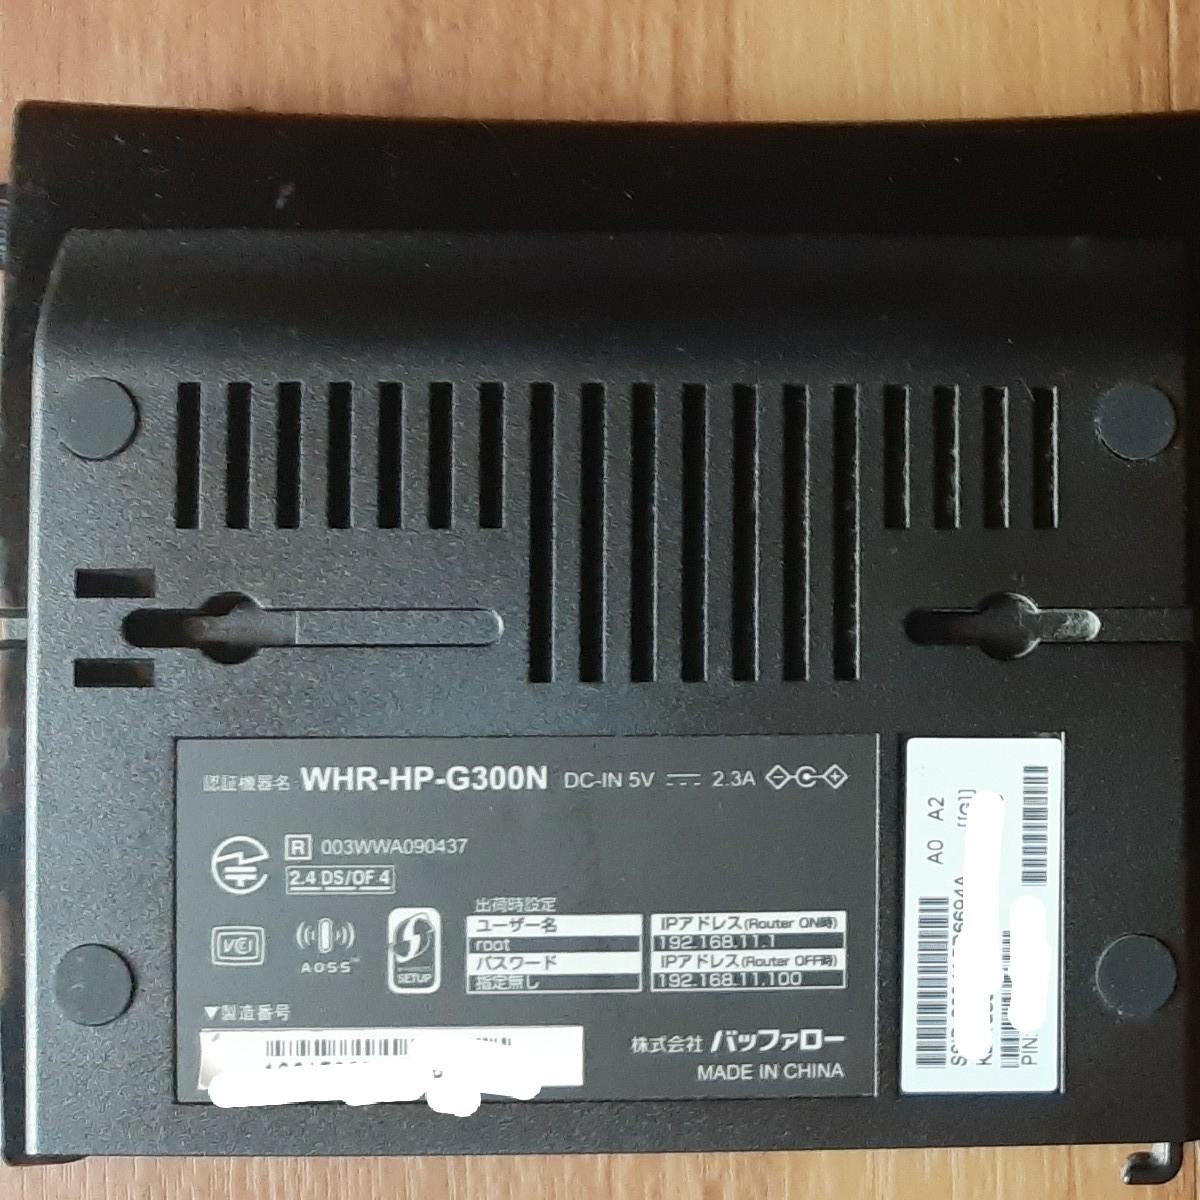 BUFFALO WHR-HP-G300N 無線LANルーター 11n 300Mbps